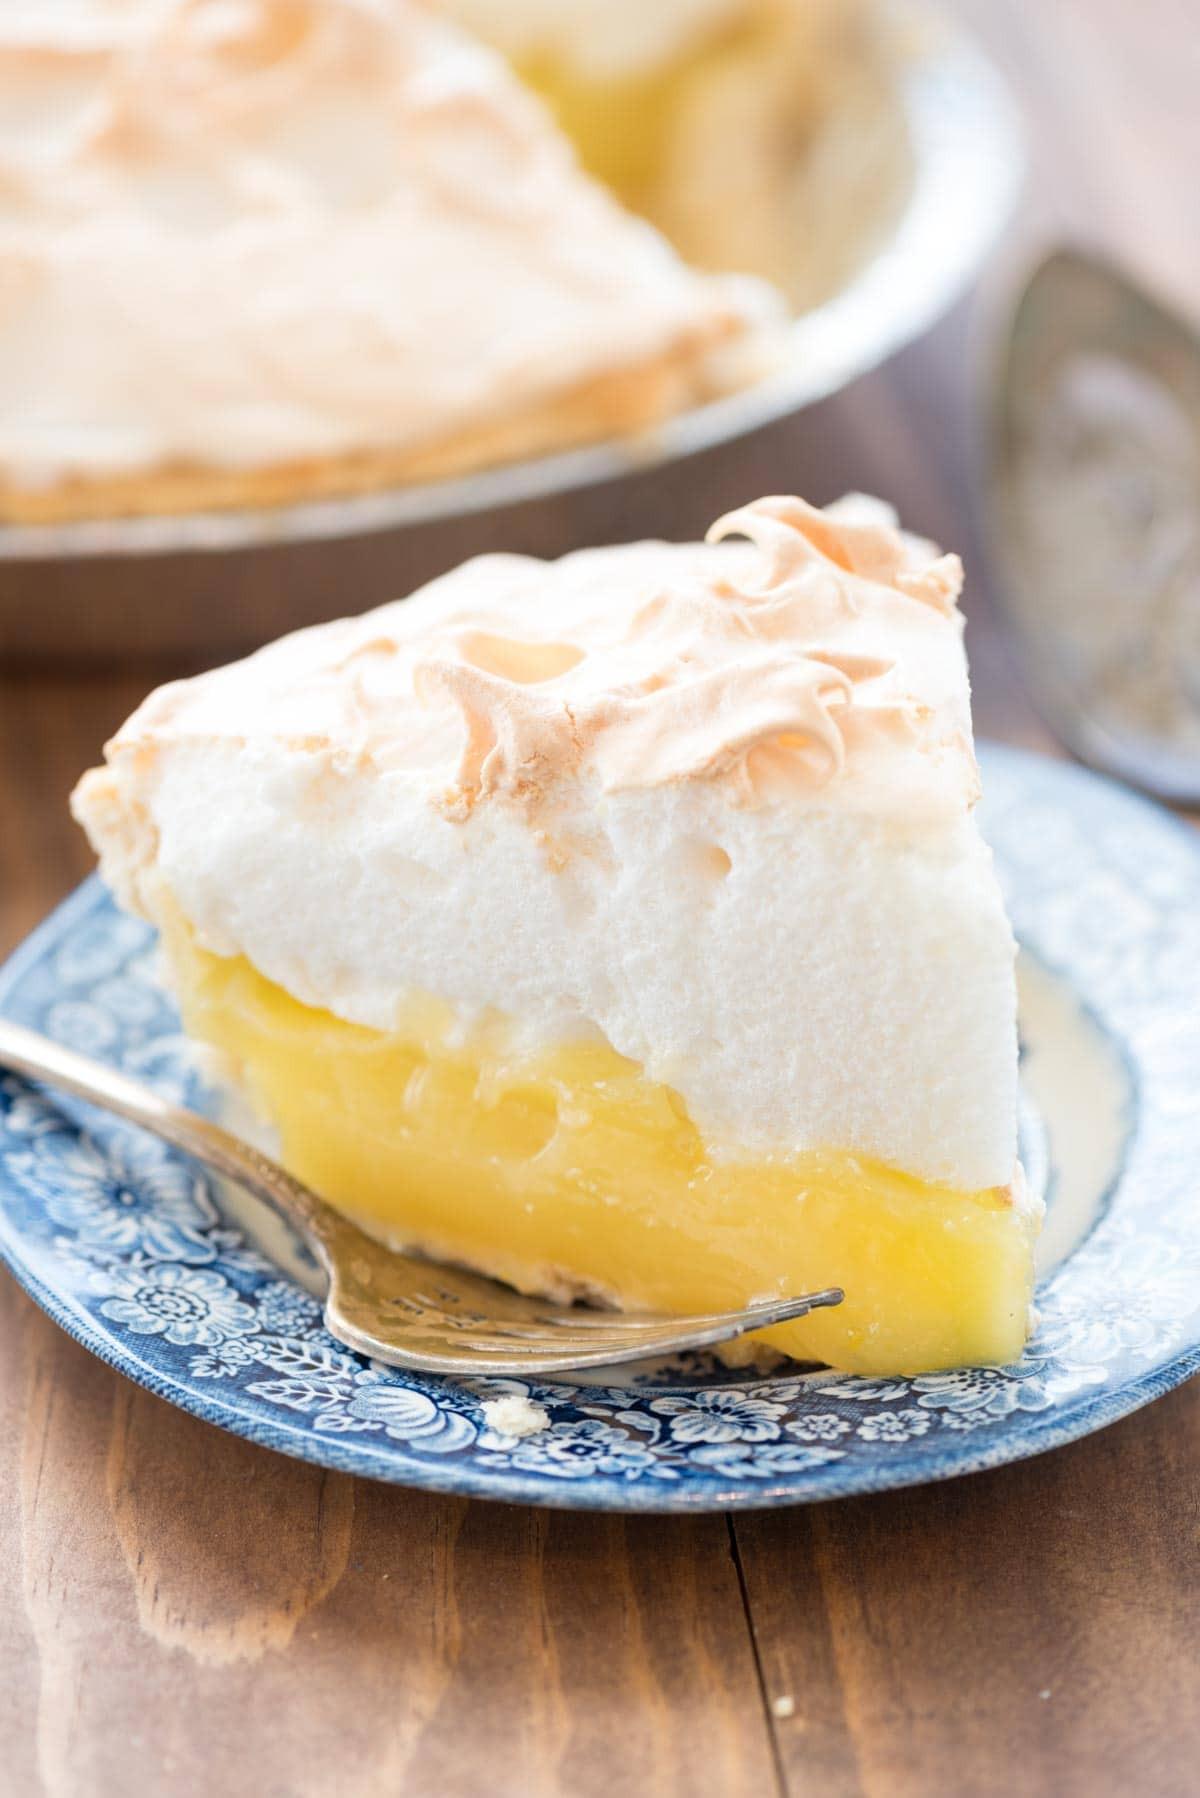 Homemade Lemon Meringue Pie  quick and easy lemon meringue pie